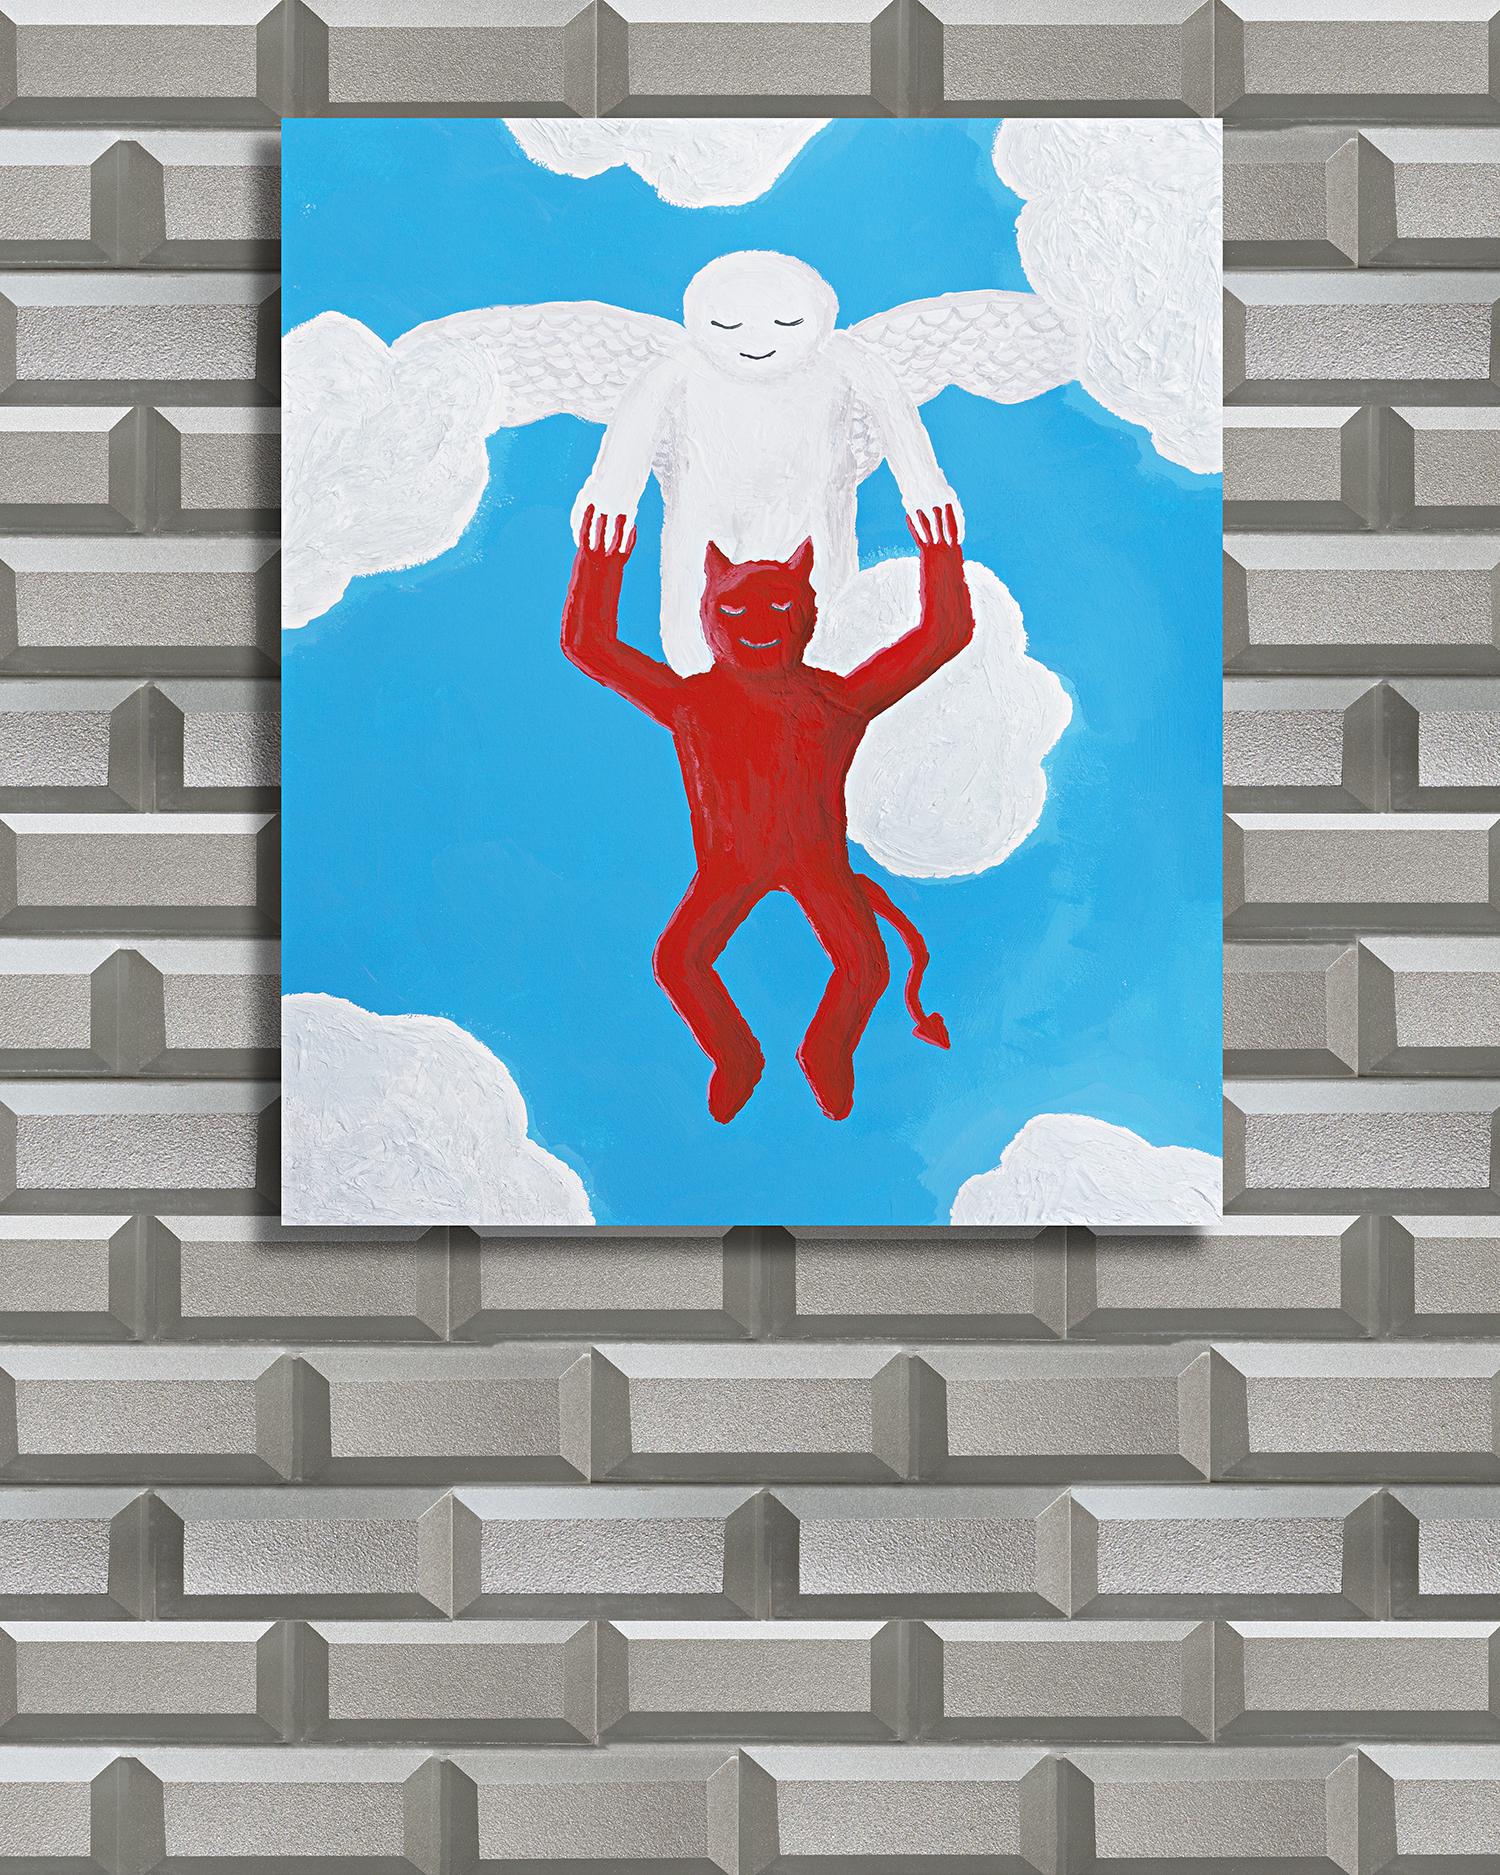 painting on brick wall copy.jpg